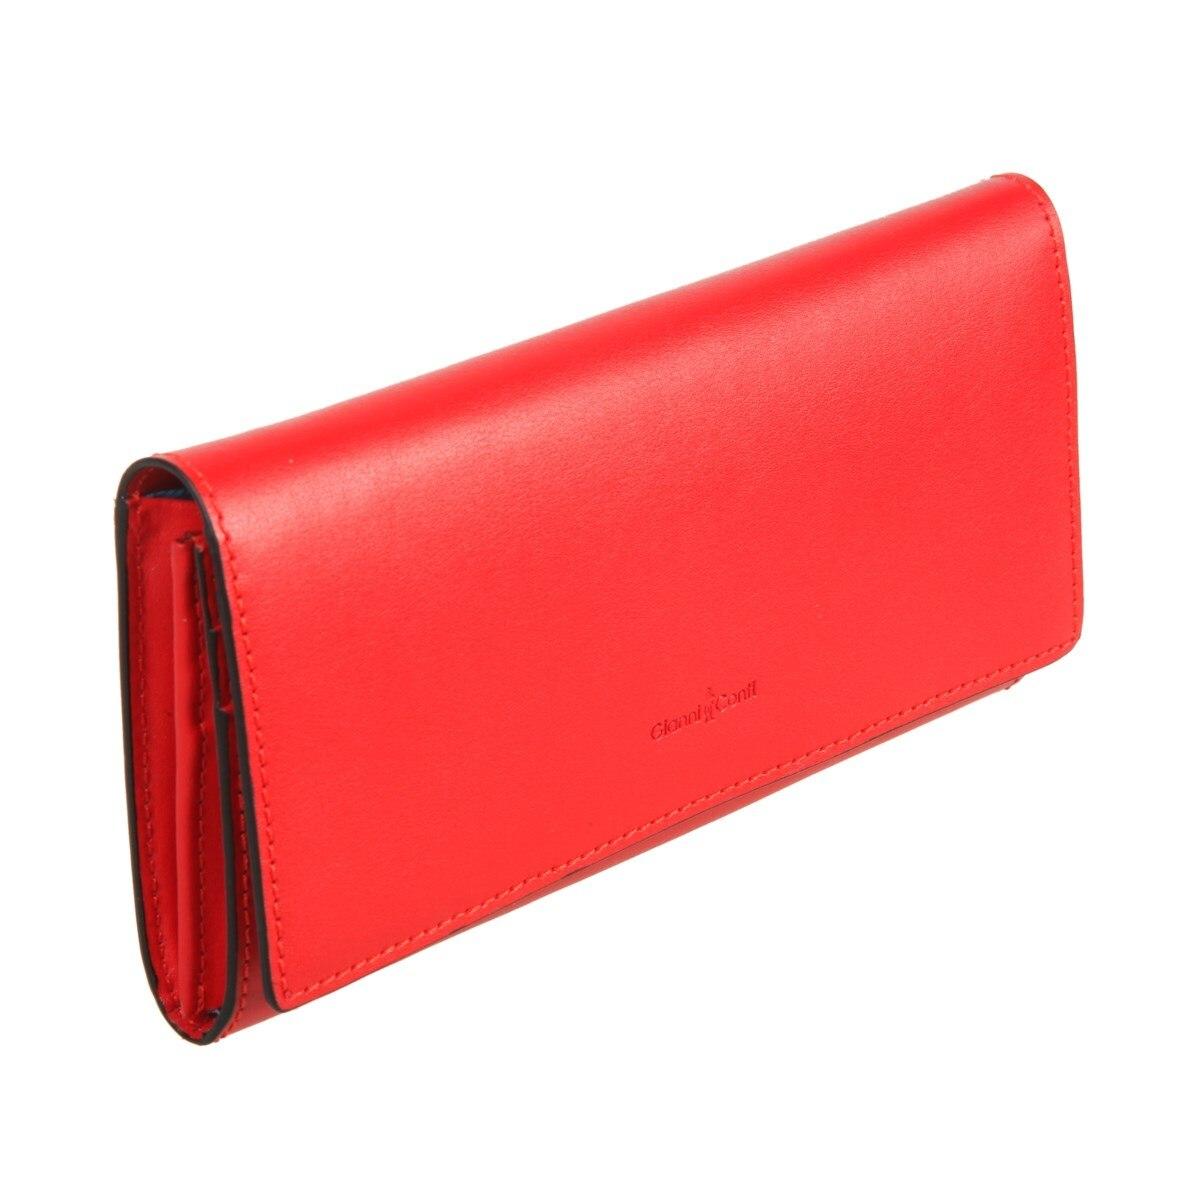 Purse Gianni Conti 1788254 red